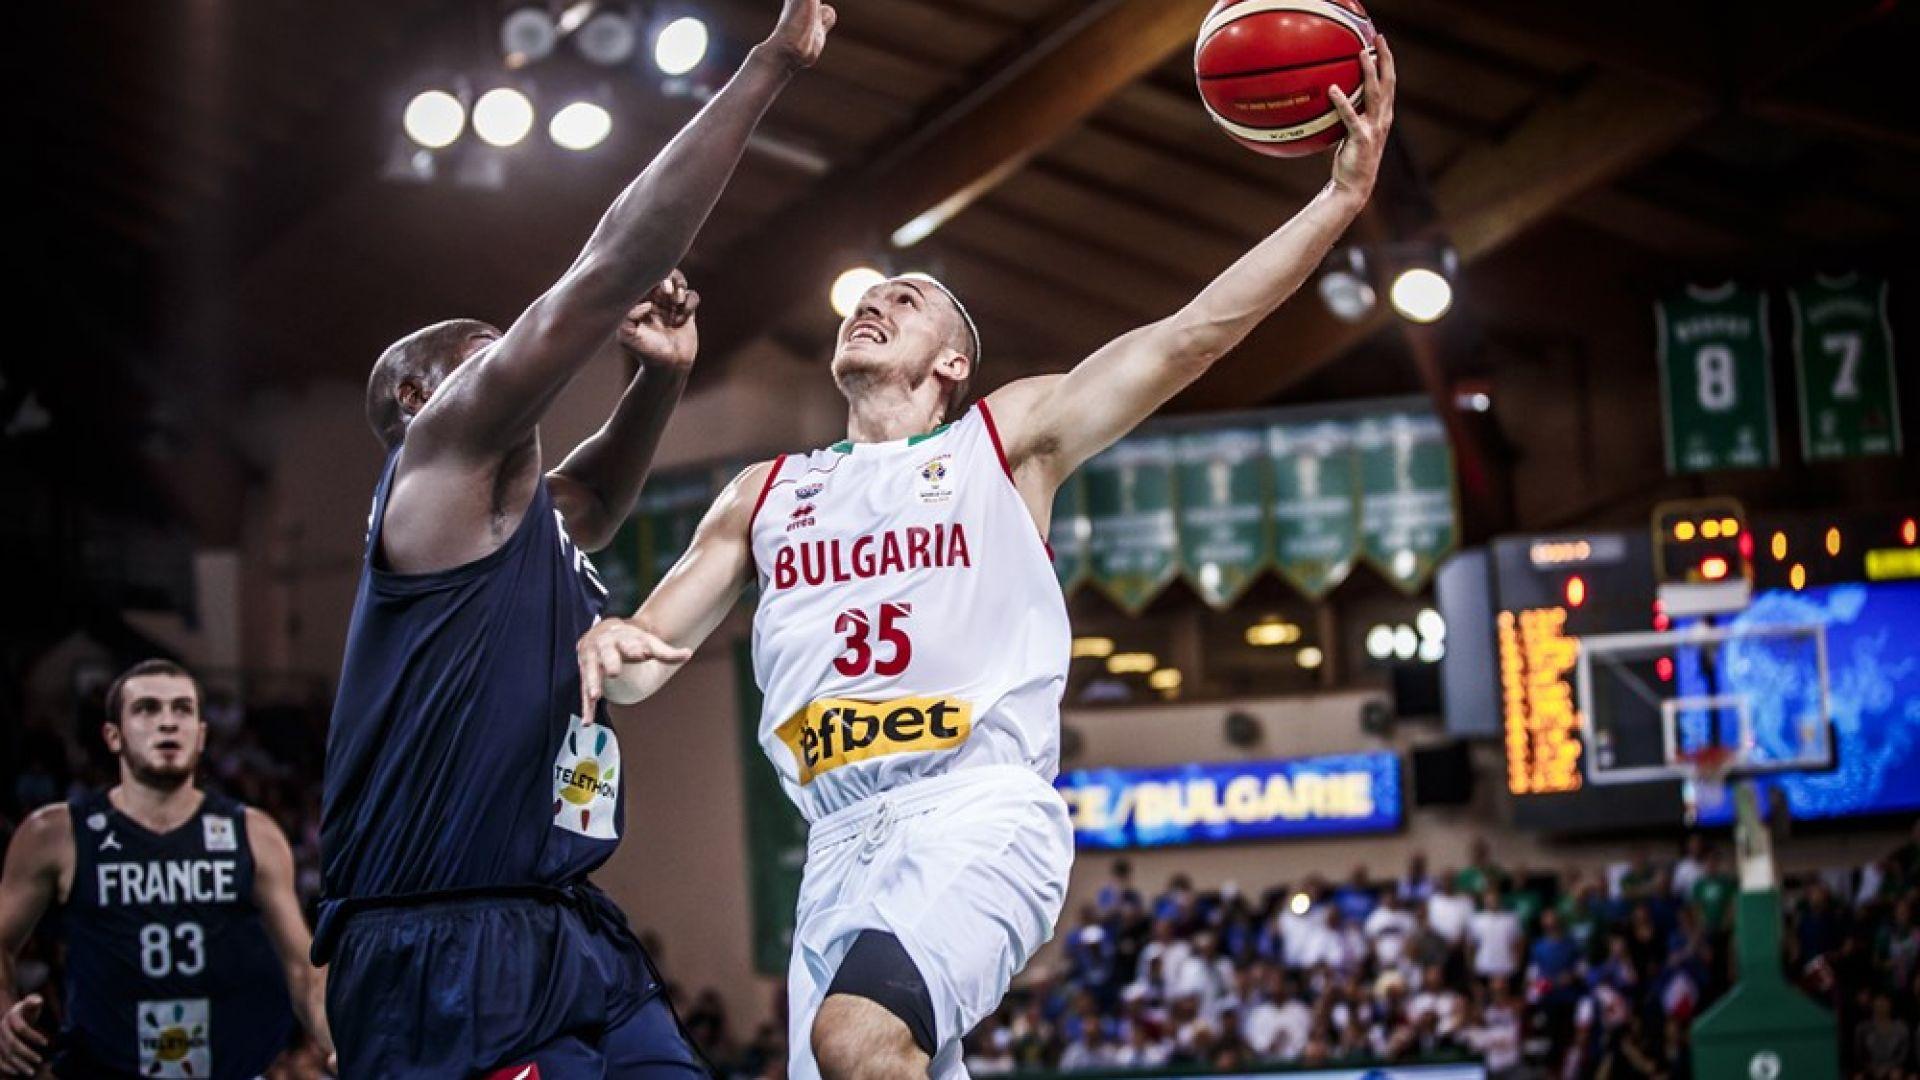 България не повтори баскетболното чудо